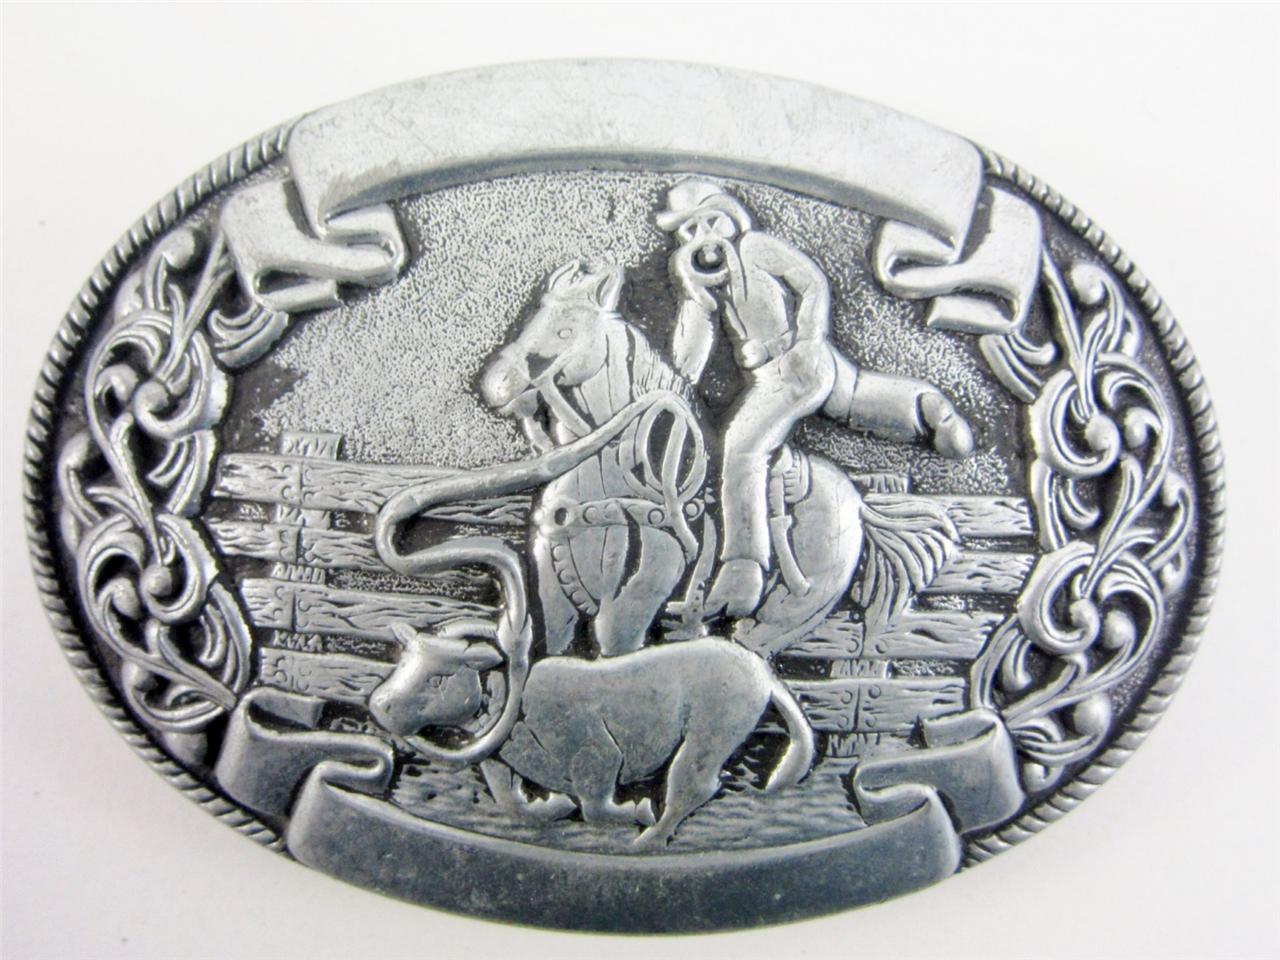 Vintage rodeo trophy buckles